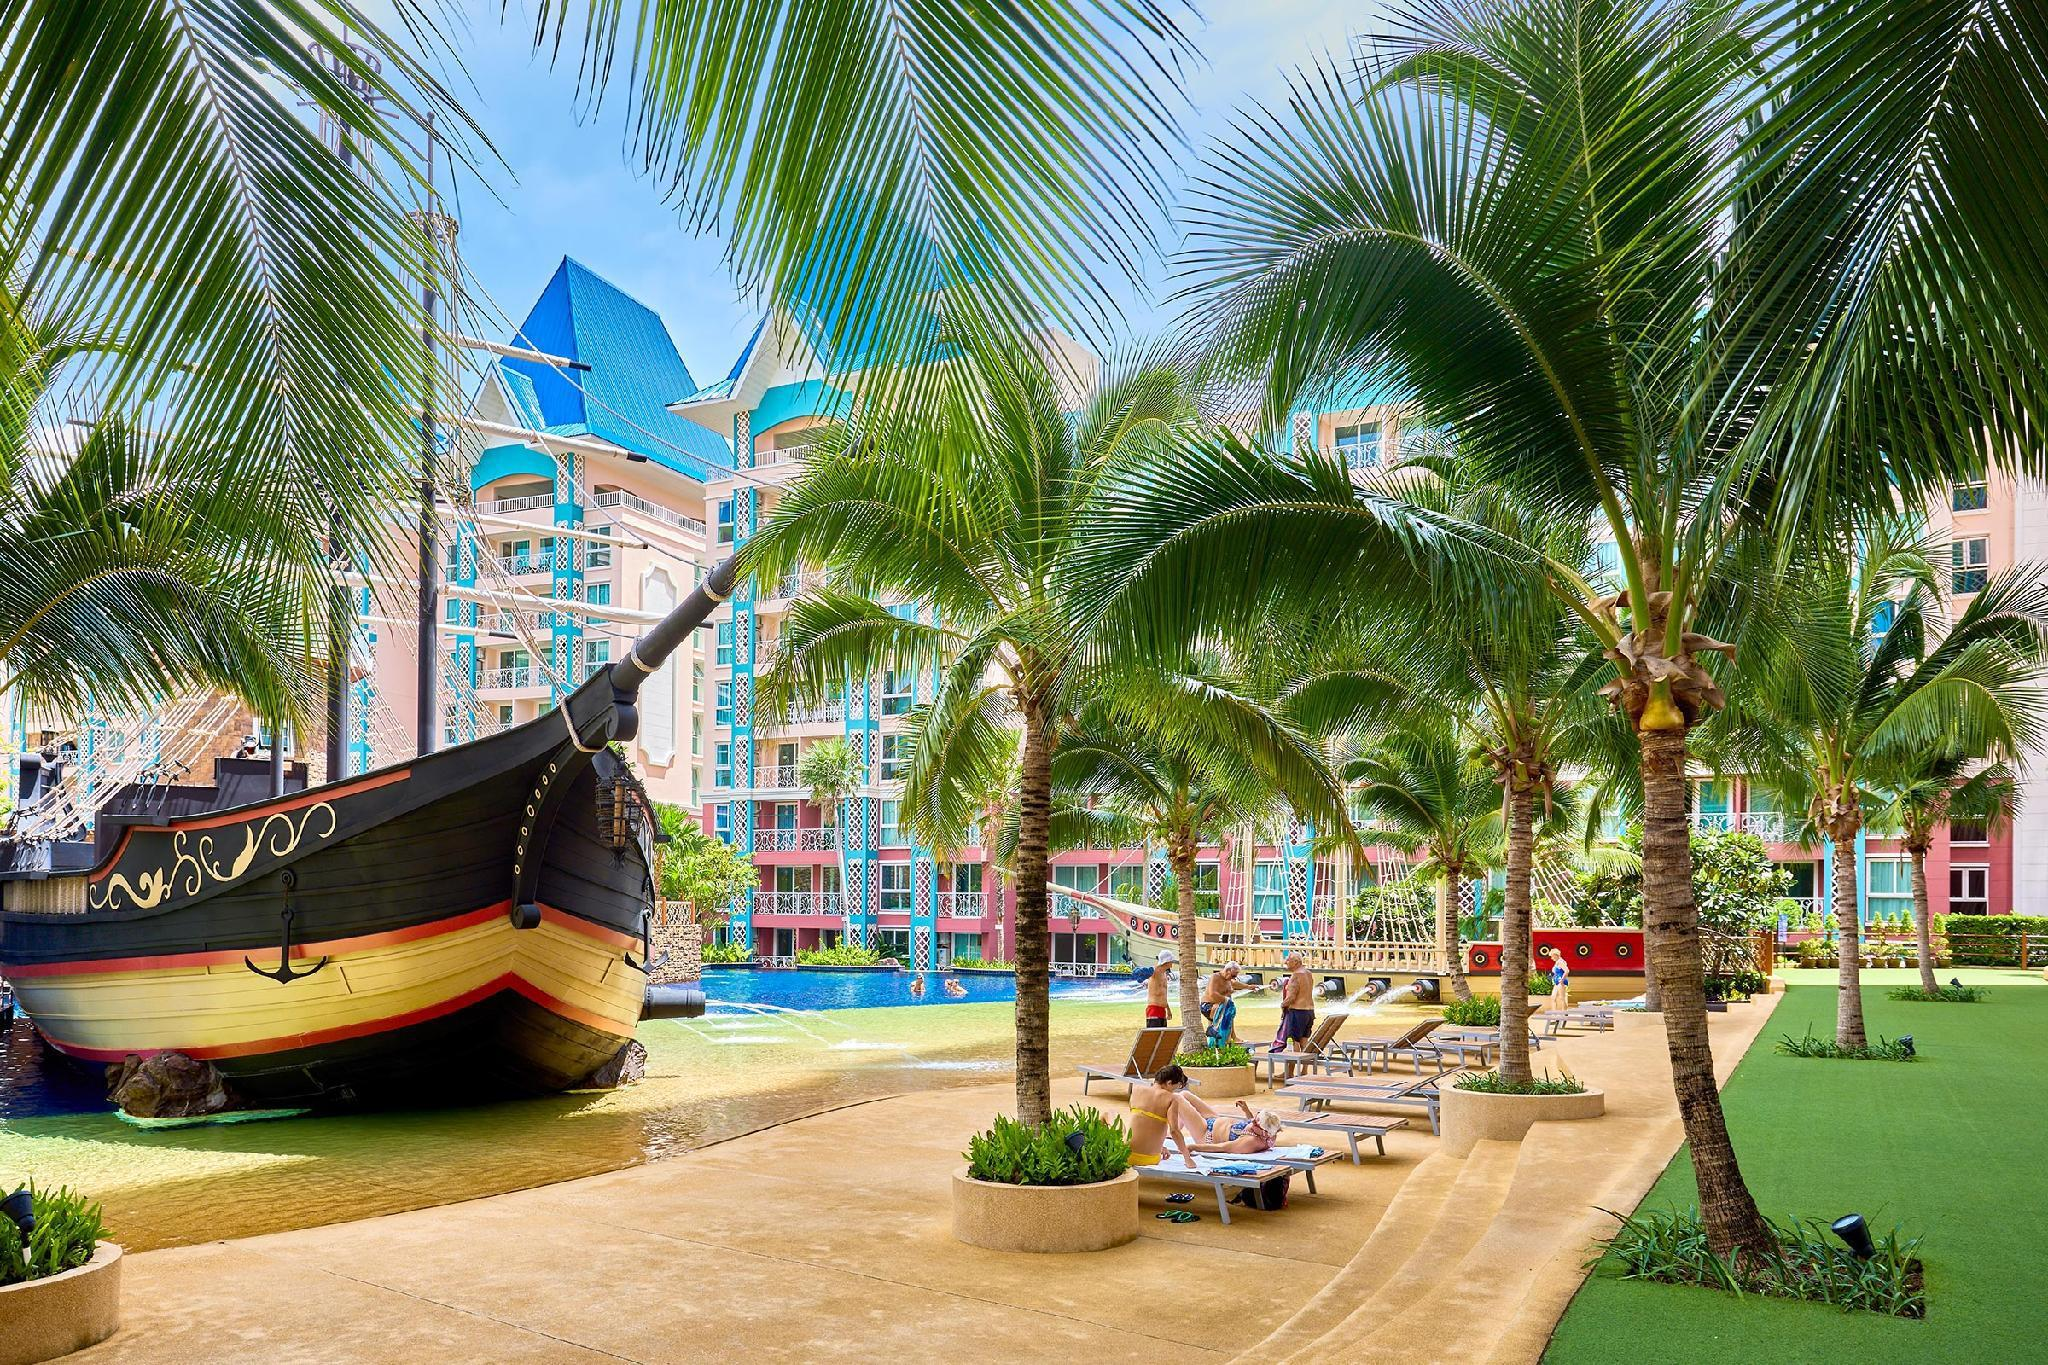 Grande Caribbean apartment resort กรันเด คาริบเบียน อพาร์ตเมนต์ รีสอร์ต